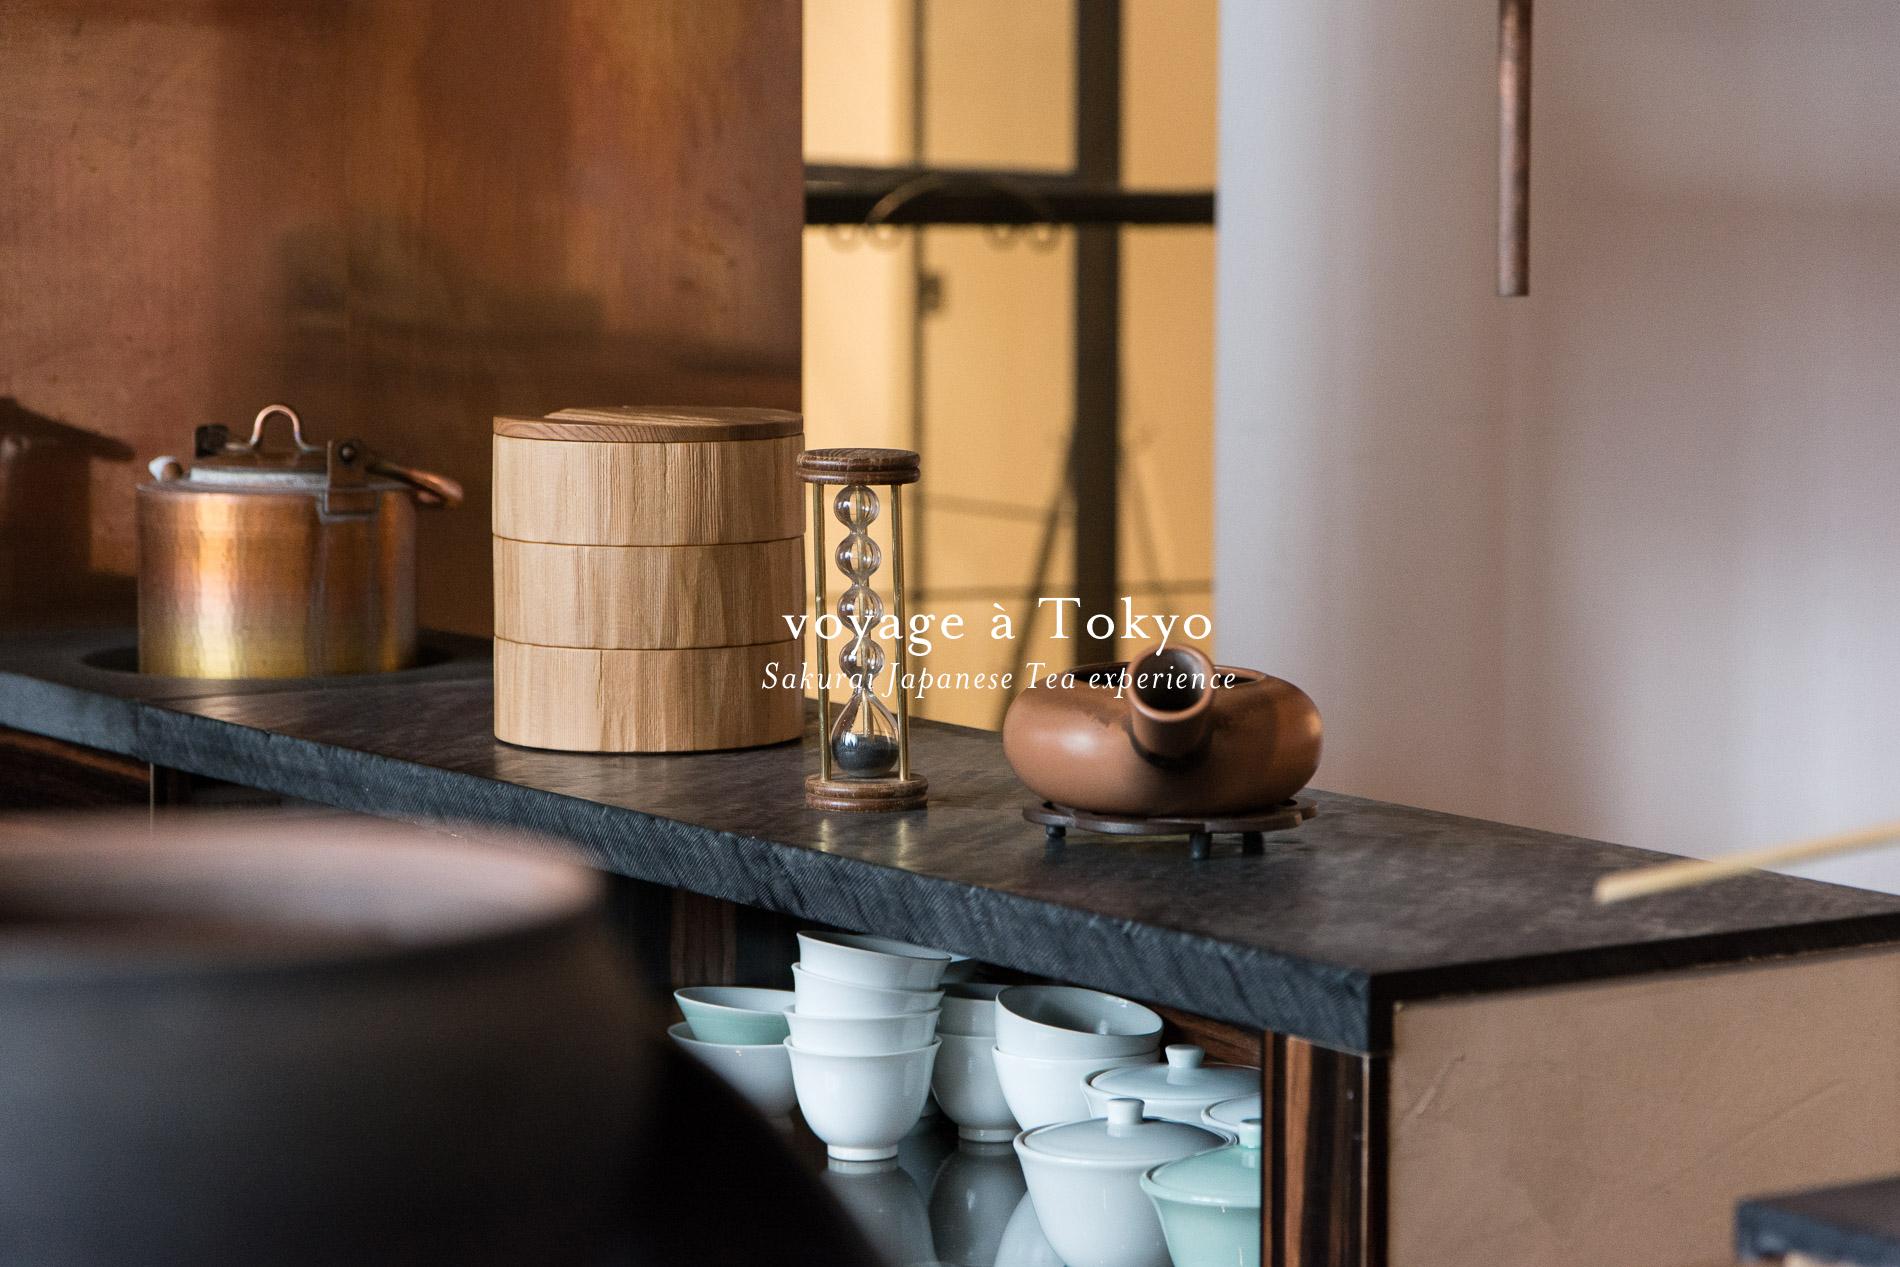 Sakurai Japanese Tea Experience D 233 Gustation De Th 233 S 224